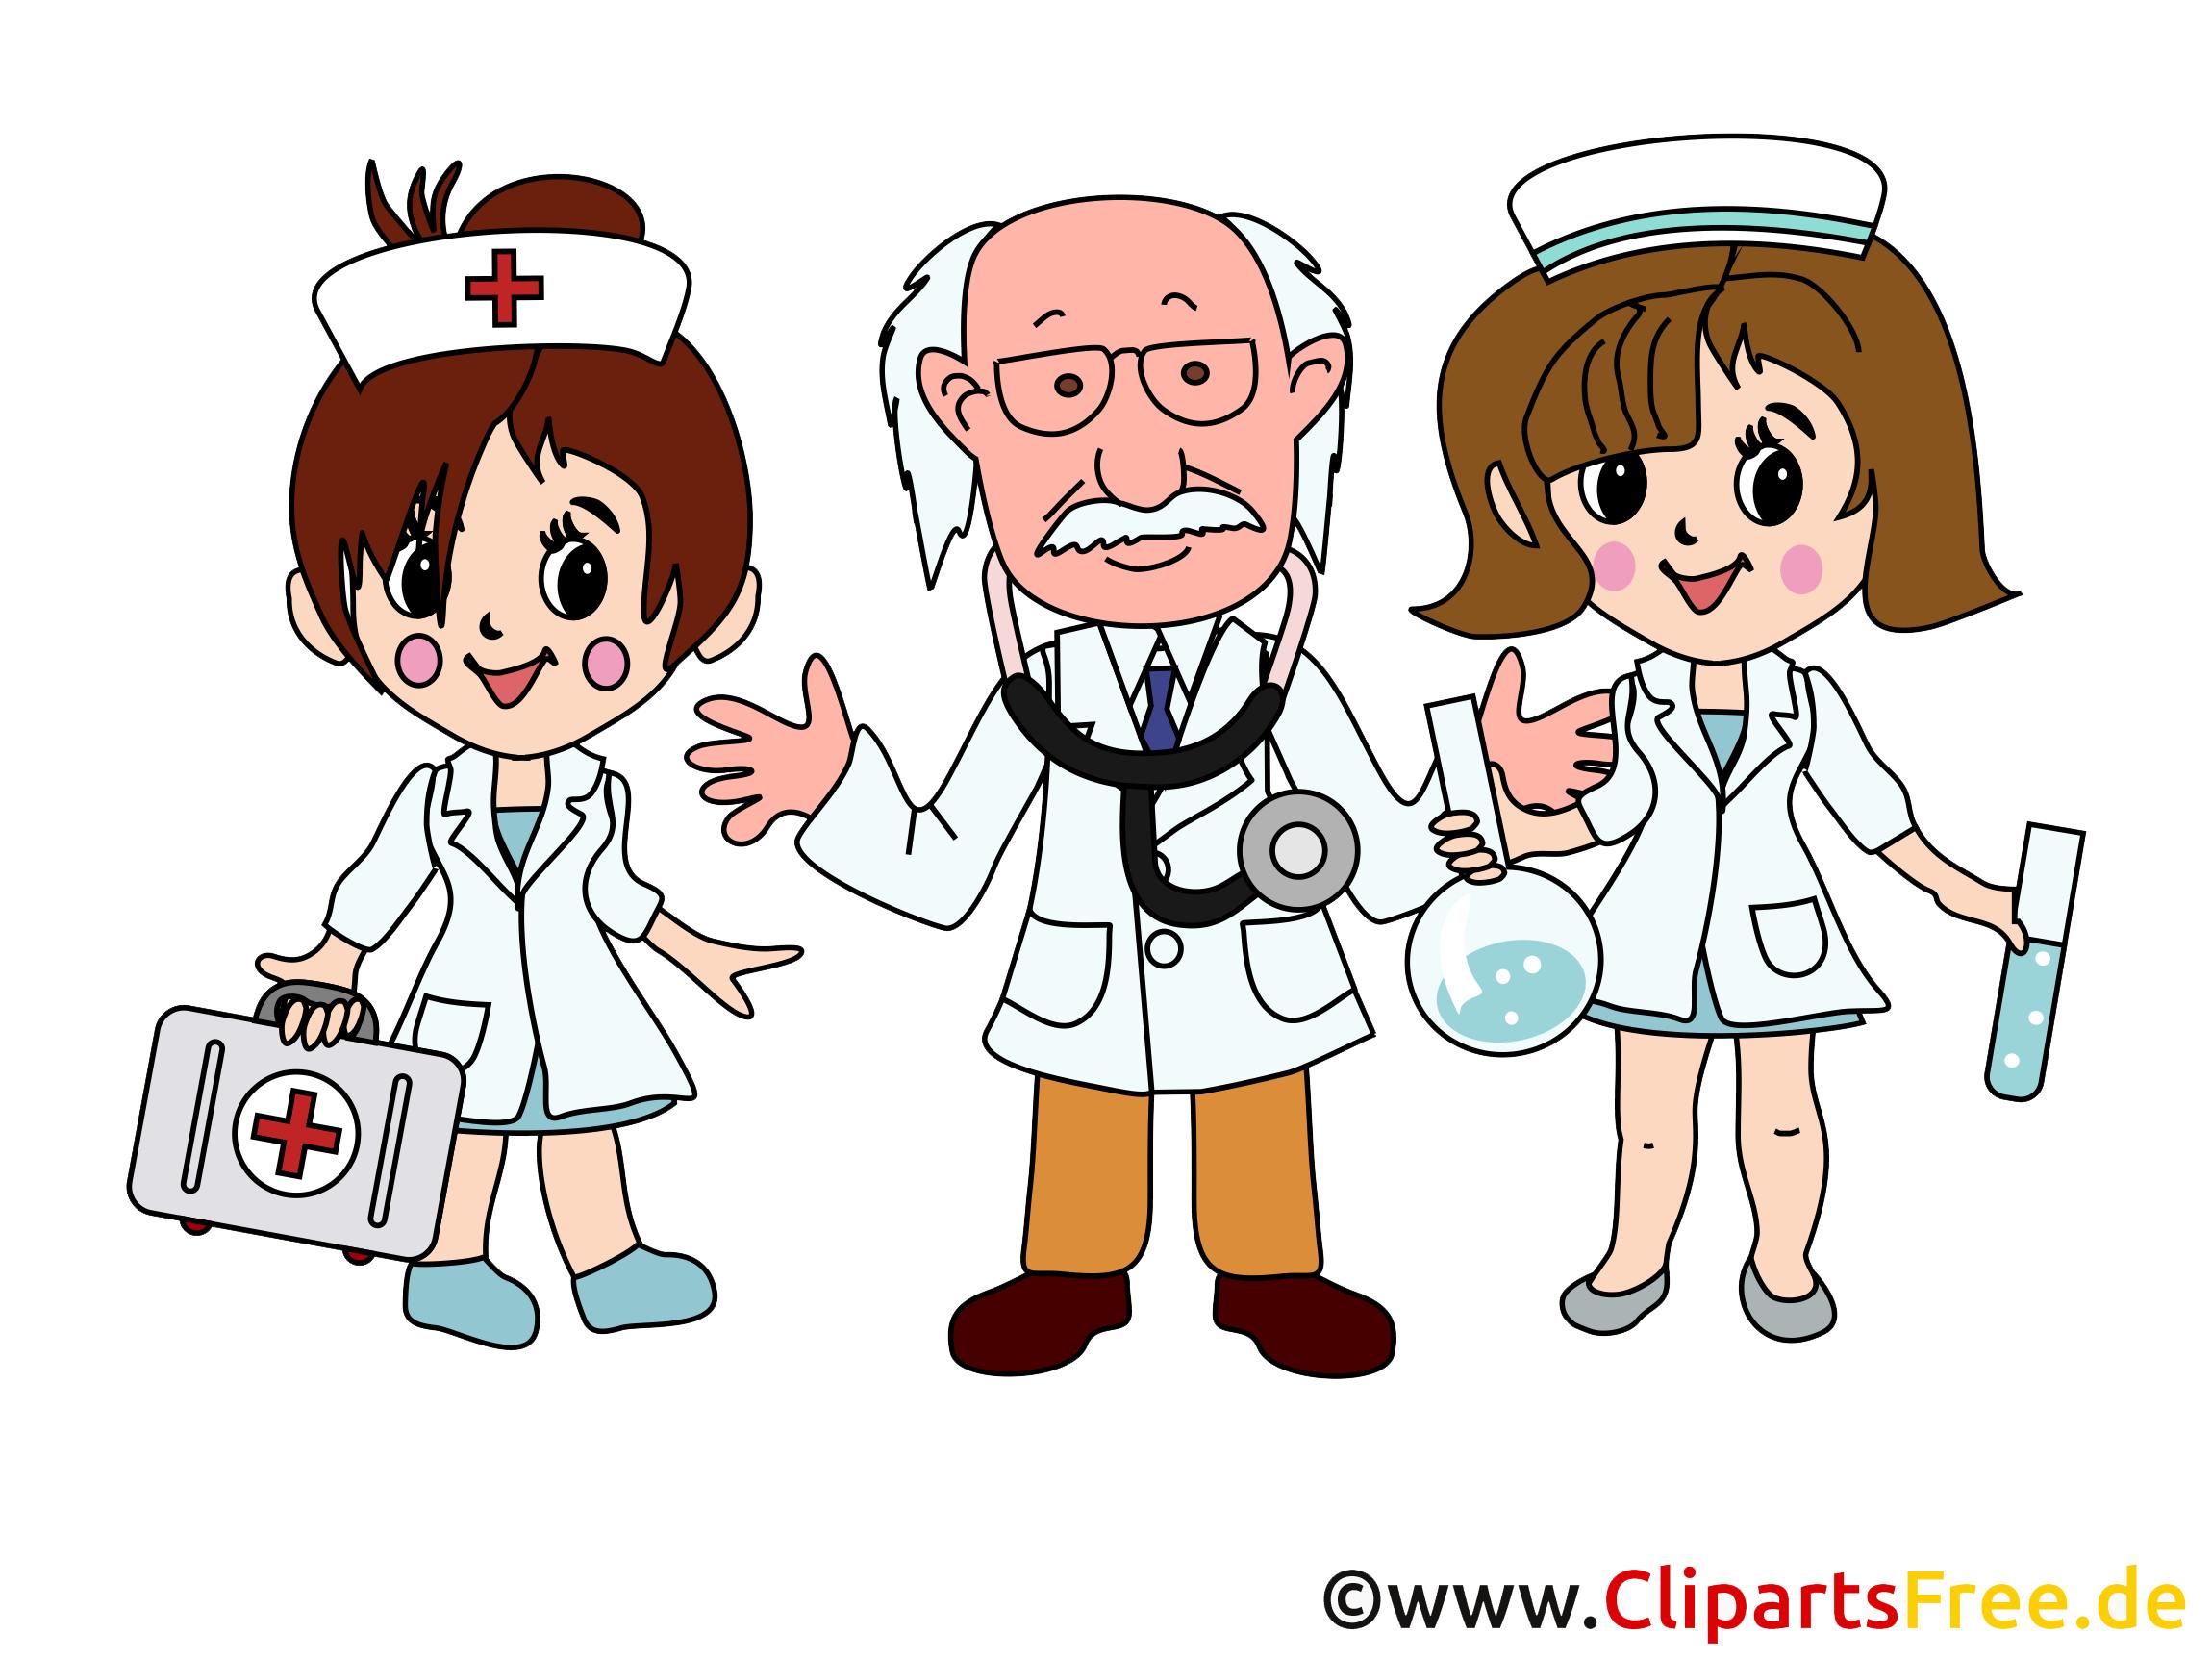 Médecin illustration - Médecine images